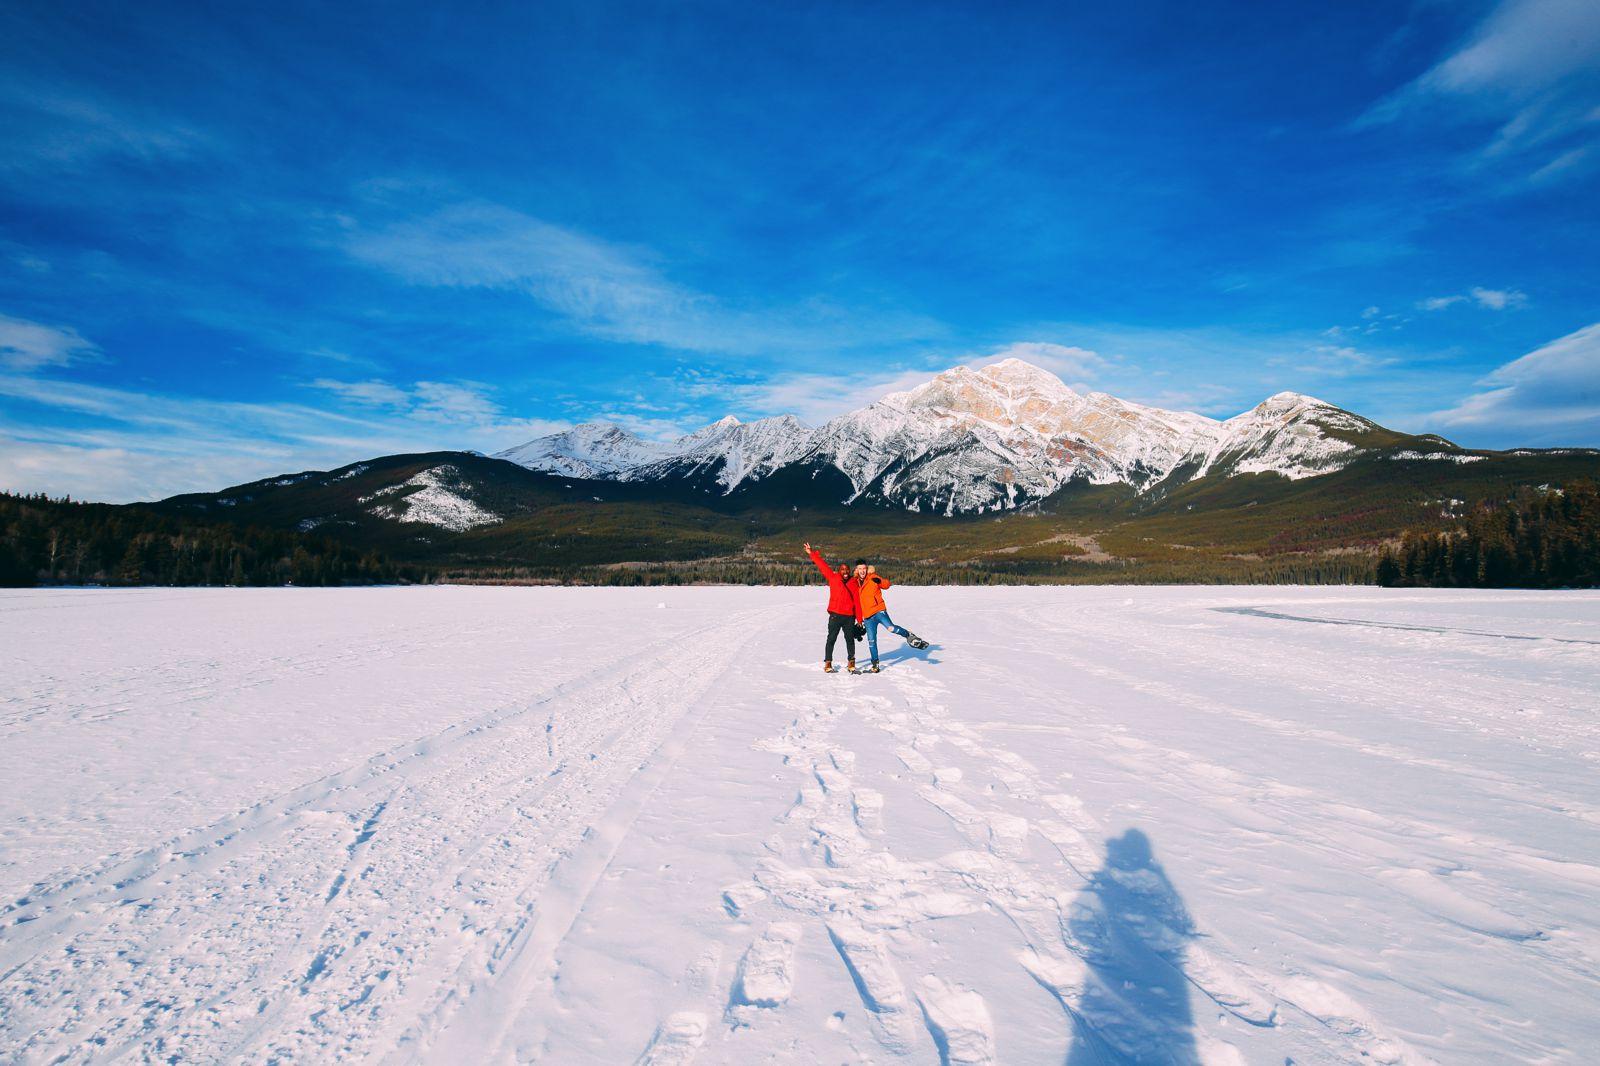 Dog Sledding In Jasper And Ice Hockey In Edmonton - 2 Canadian 'Must-Do's! (14)